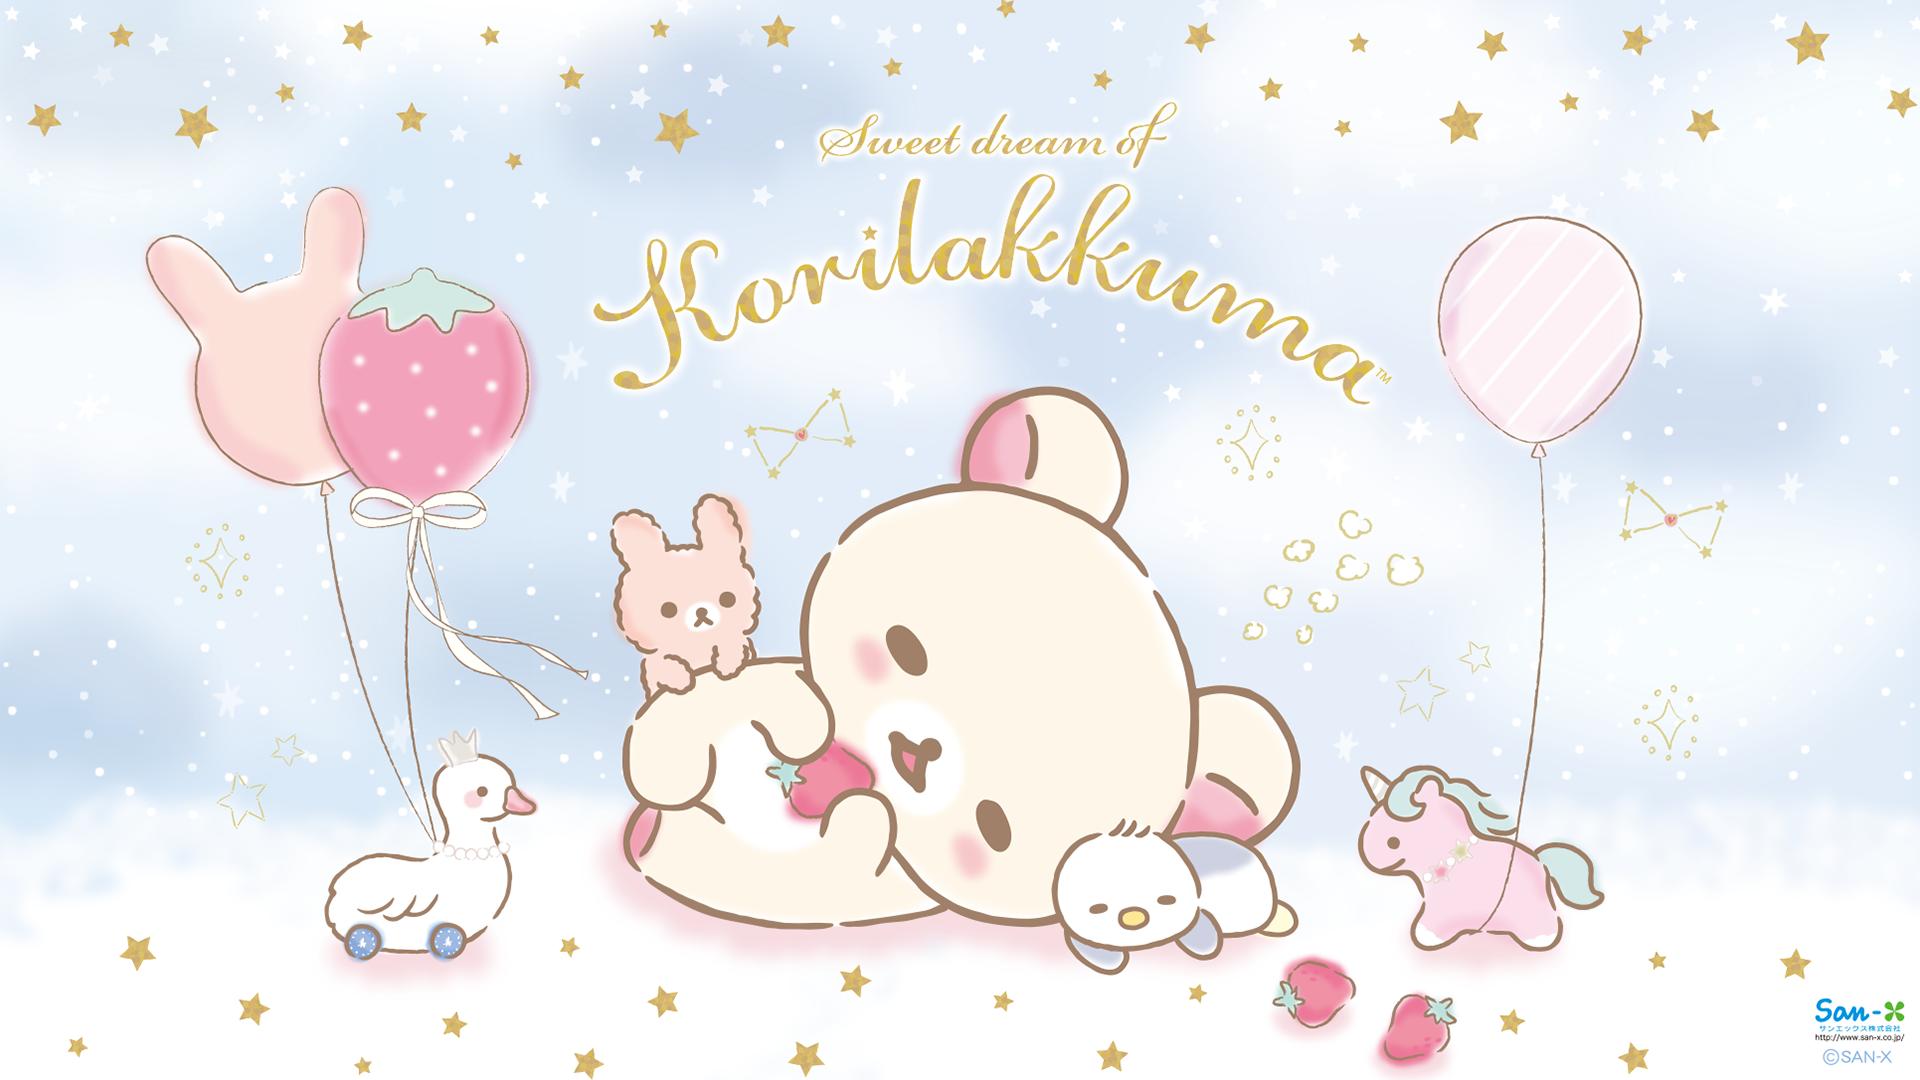 Anime Snow Cat